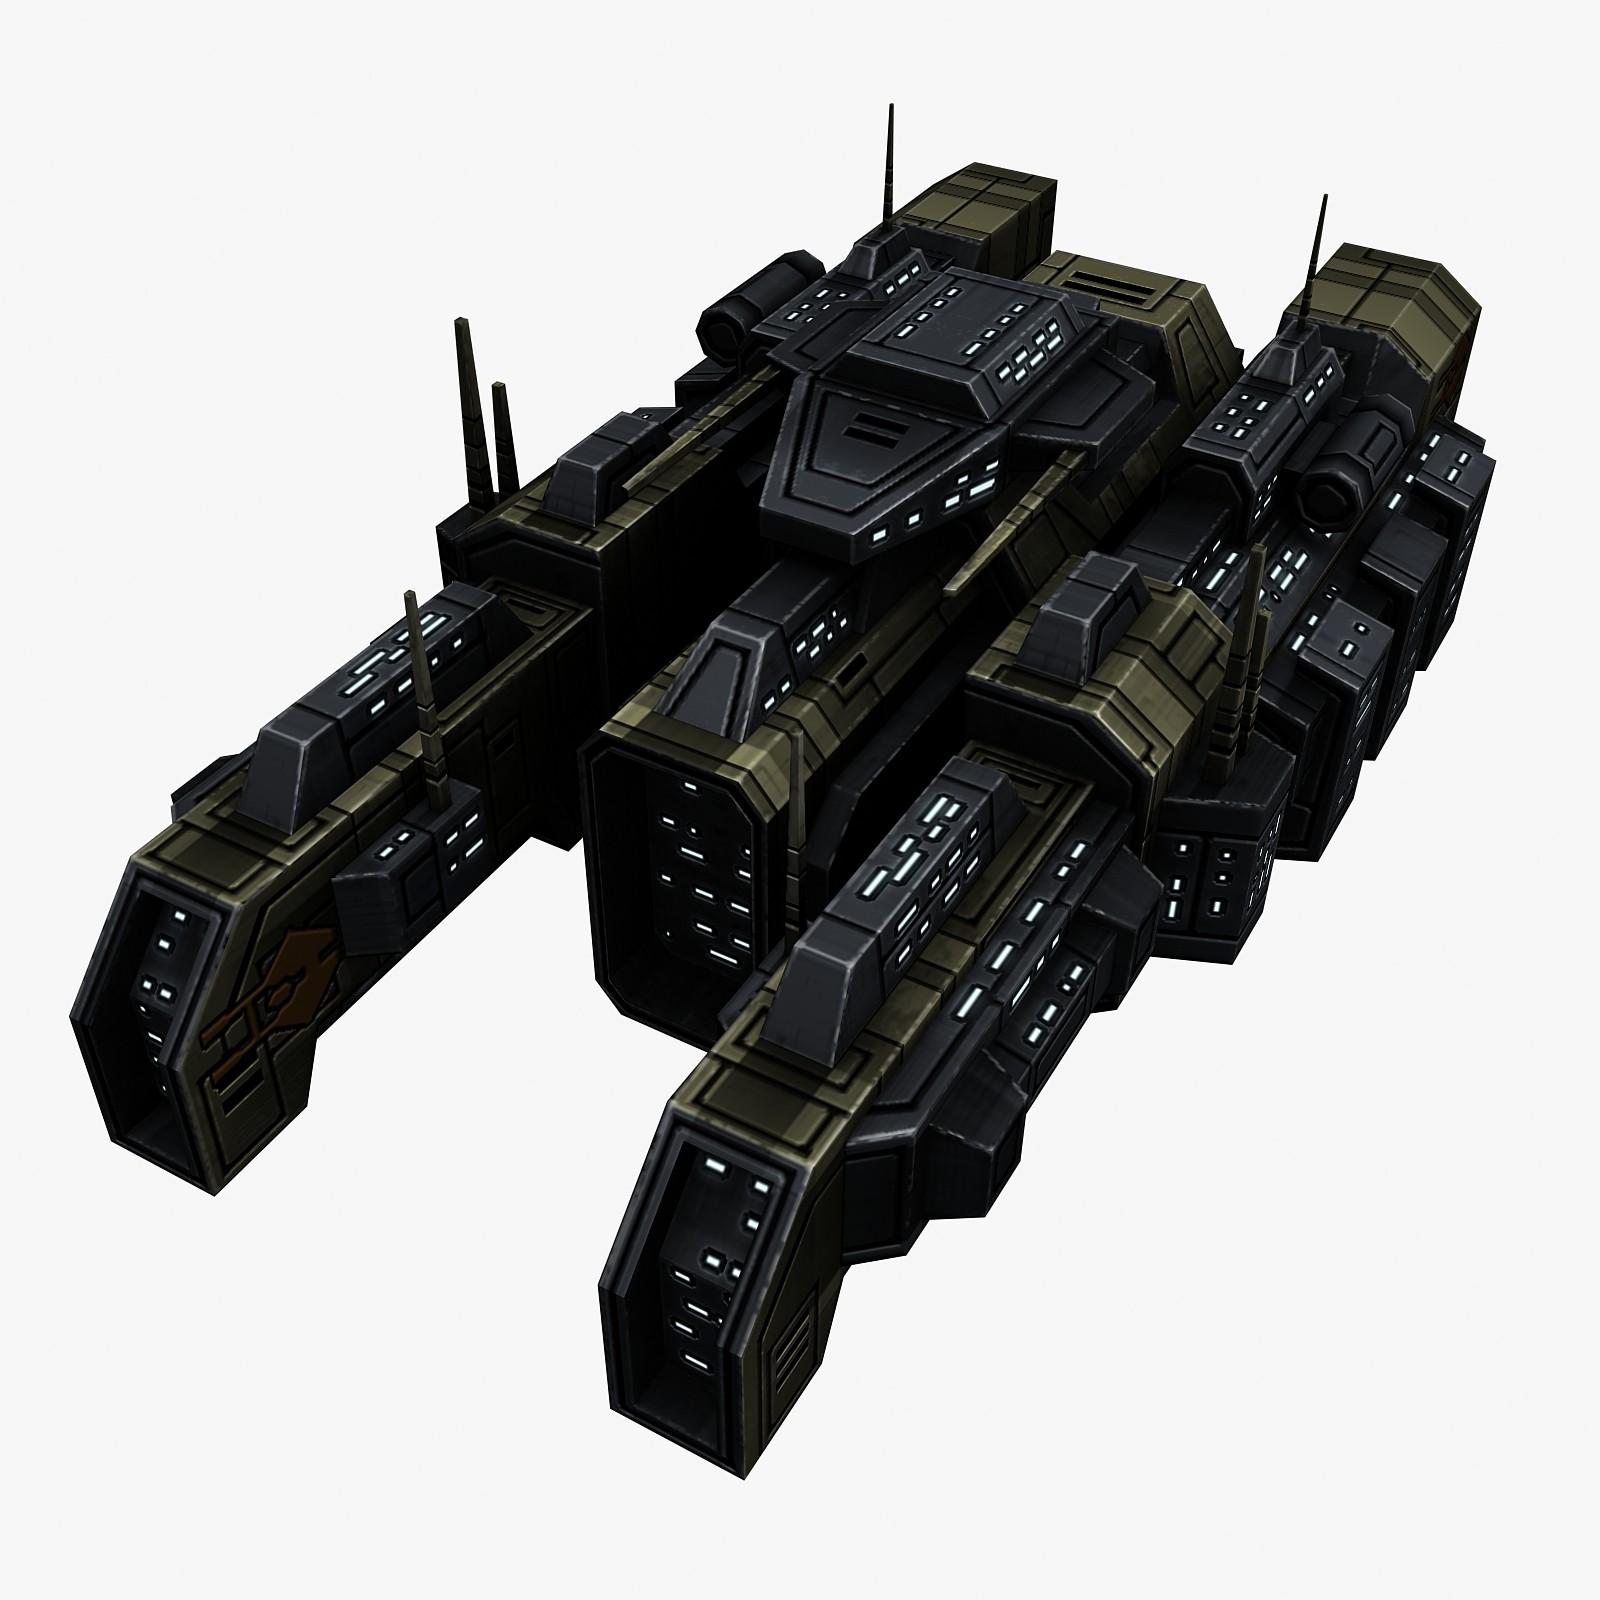 civilian_transport_spaceship_4_preview_1.jpg